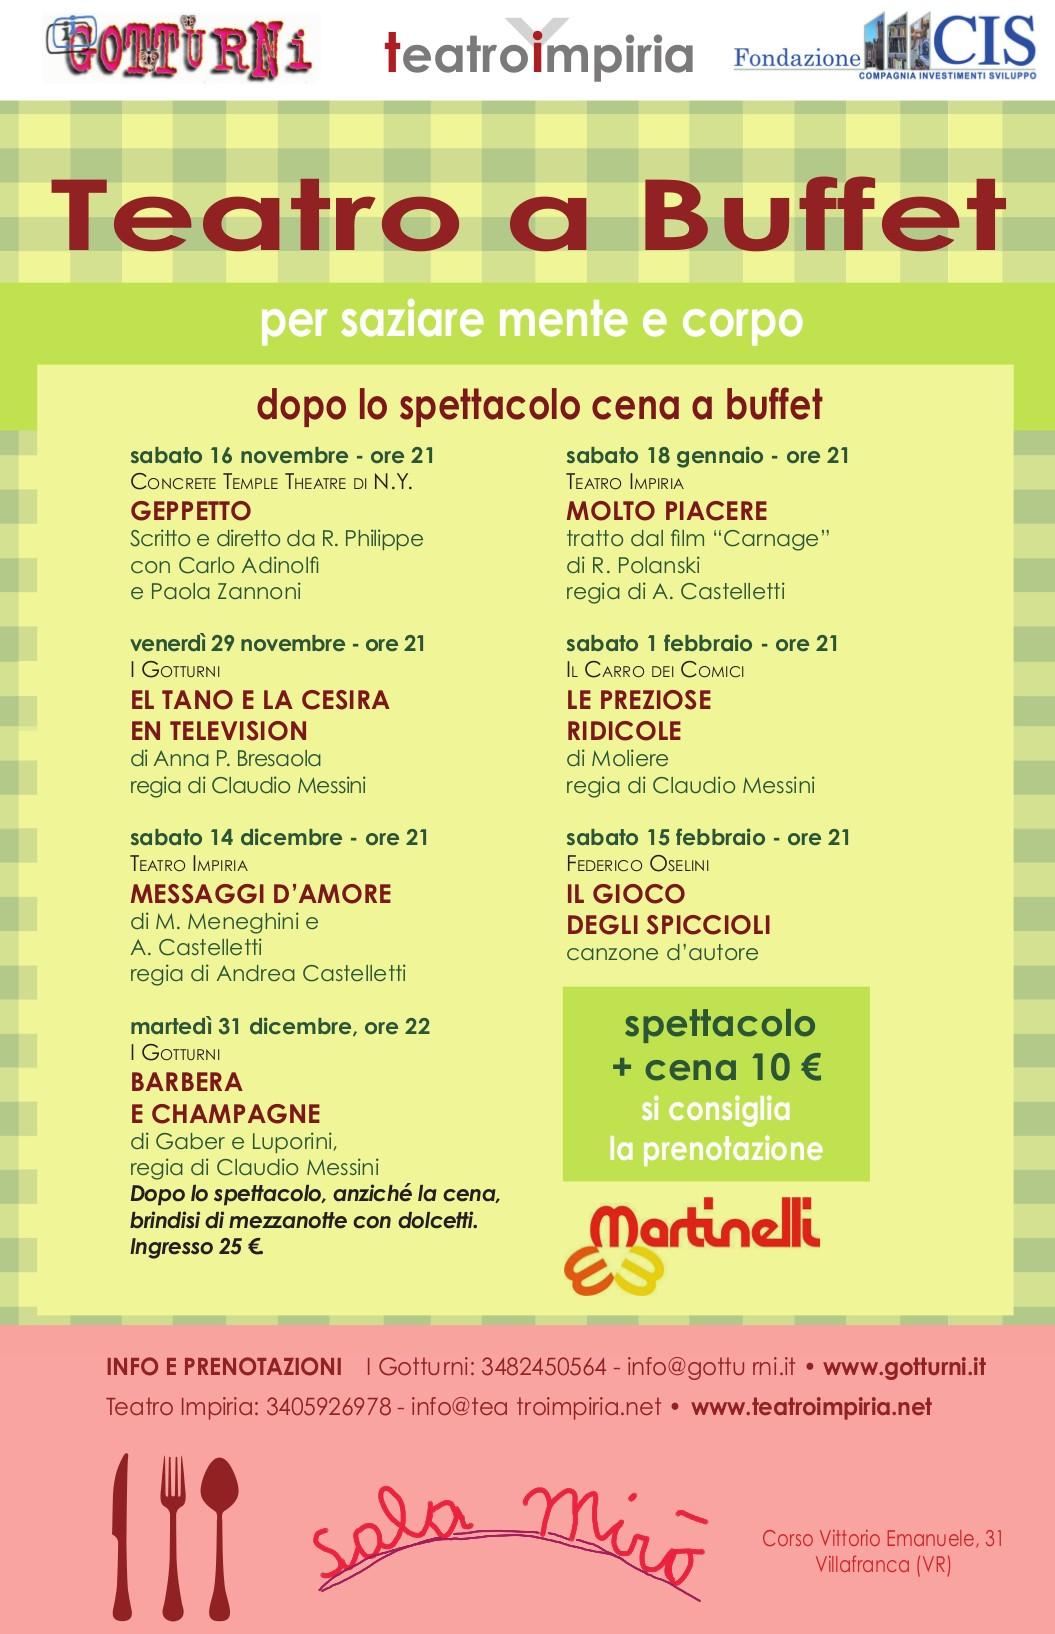 villafranca-teatro-buffet-impiria-verona-castelletti